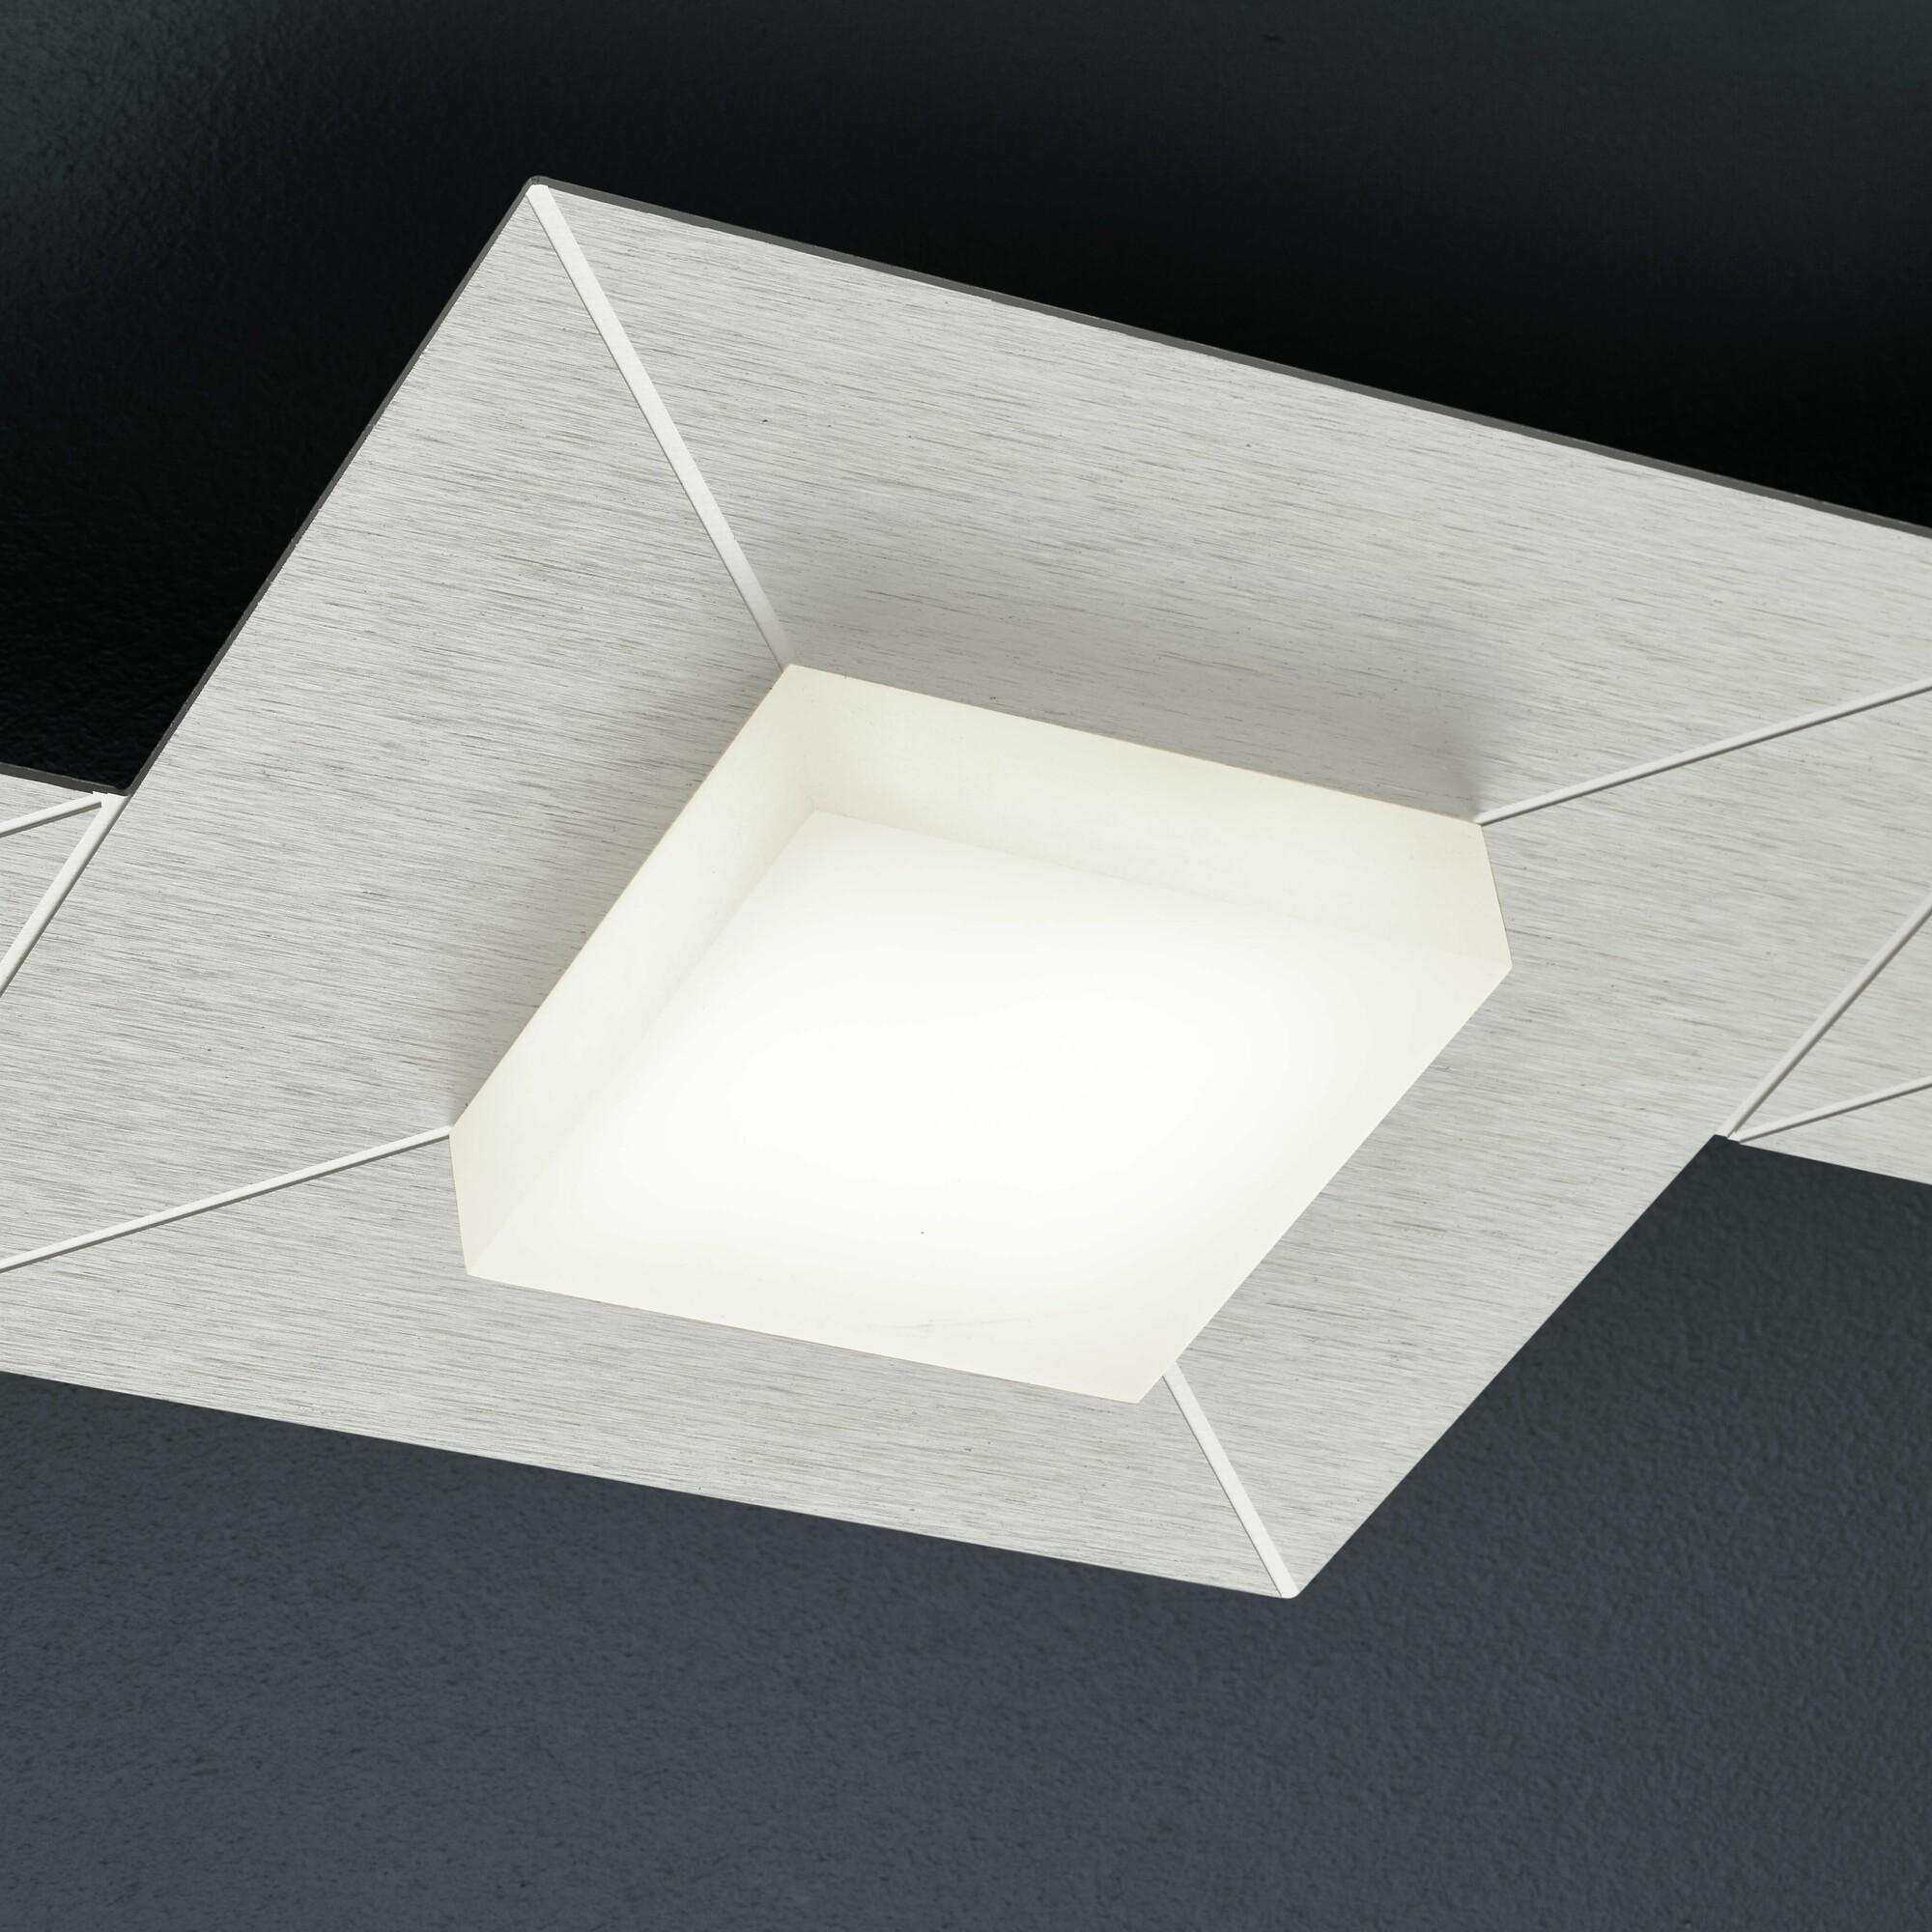 DIAMOND Plafondlamp LED 4x8W/800lm Rechthoekig Lichtgrijs